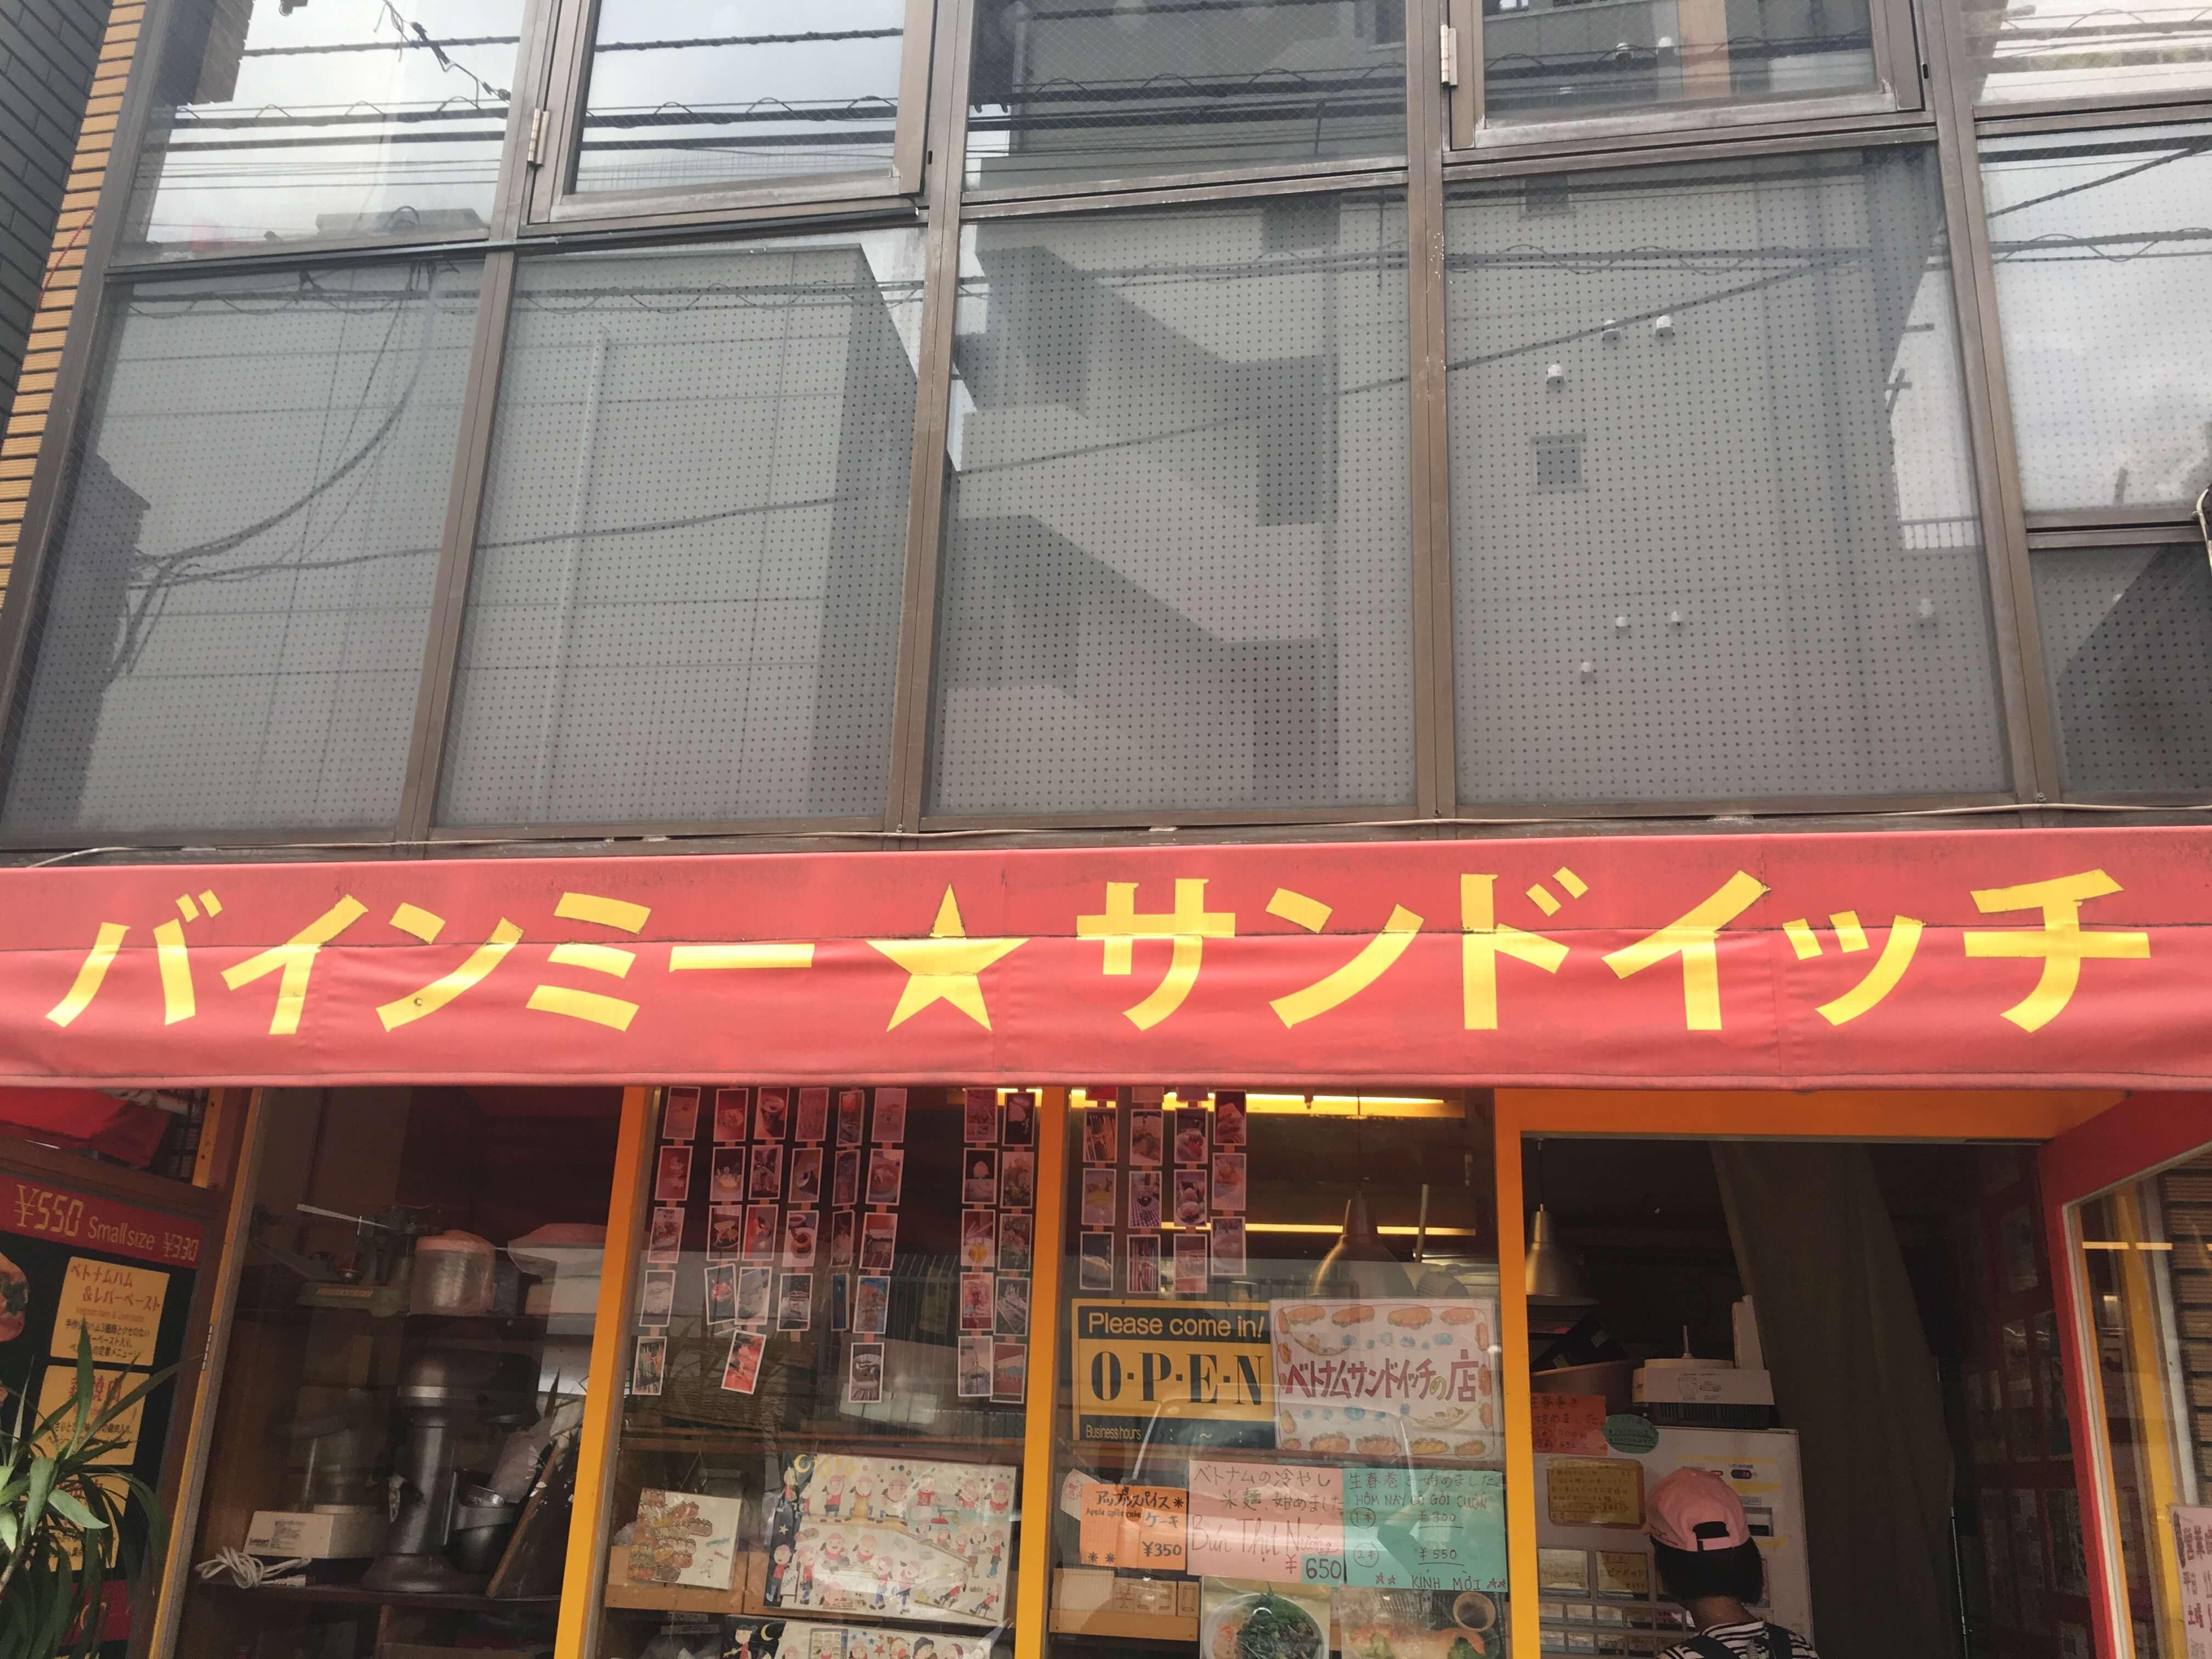 Photo of 高田馬場おすすめバインミーのお店「バインミー☆サンドイッチ」